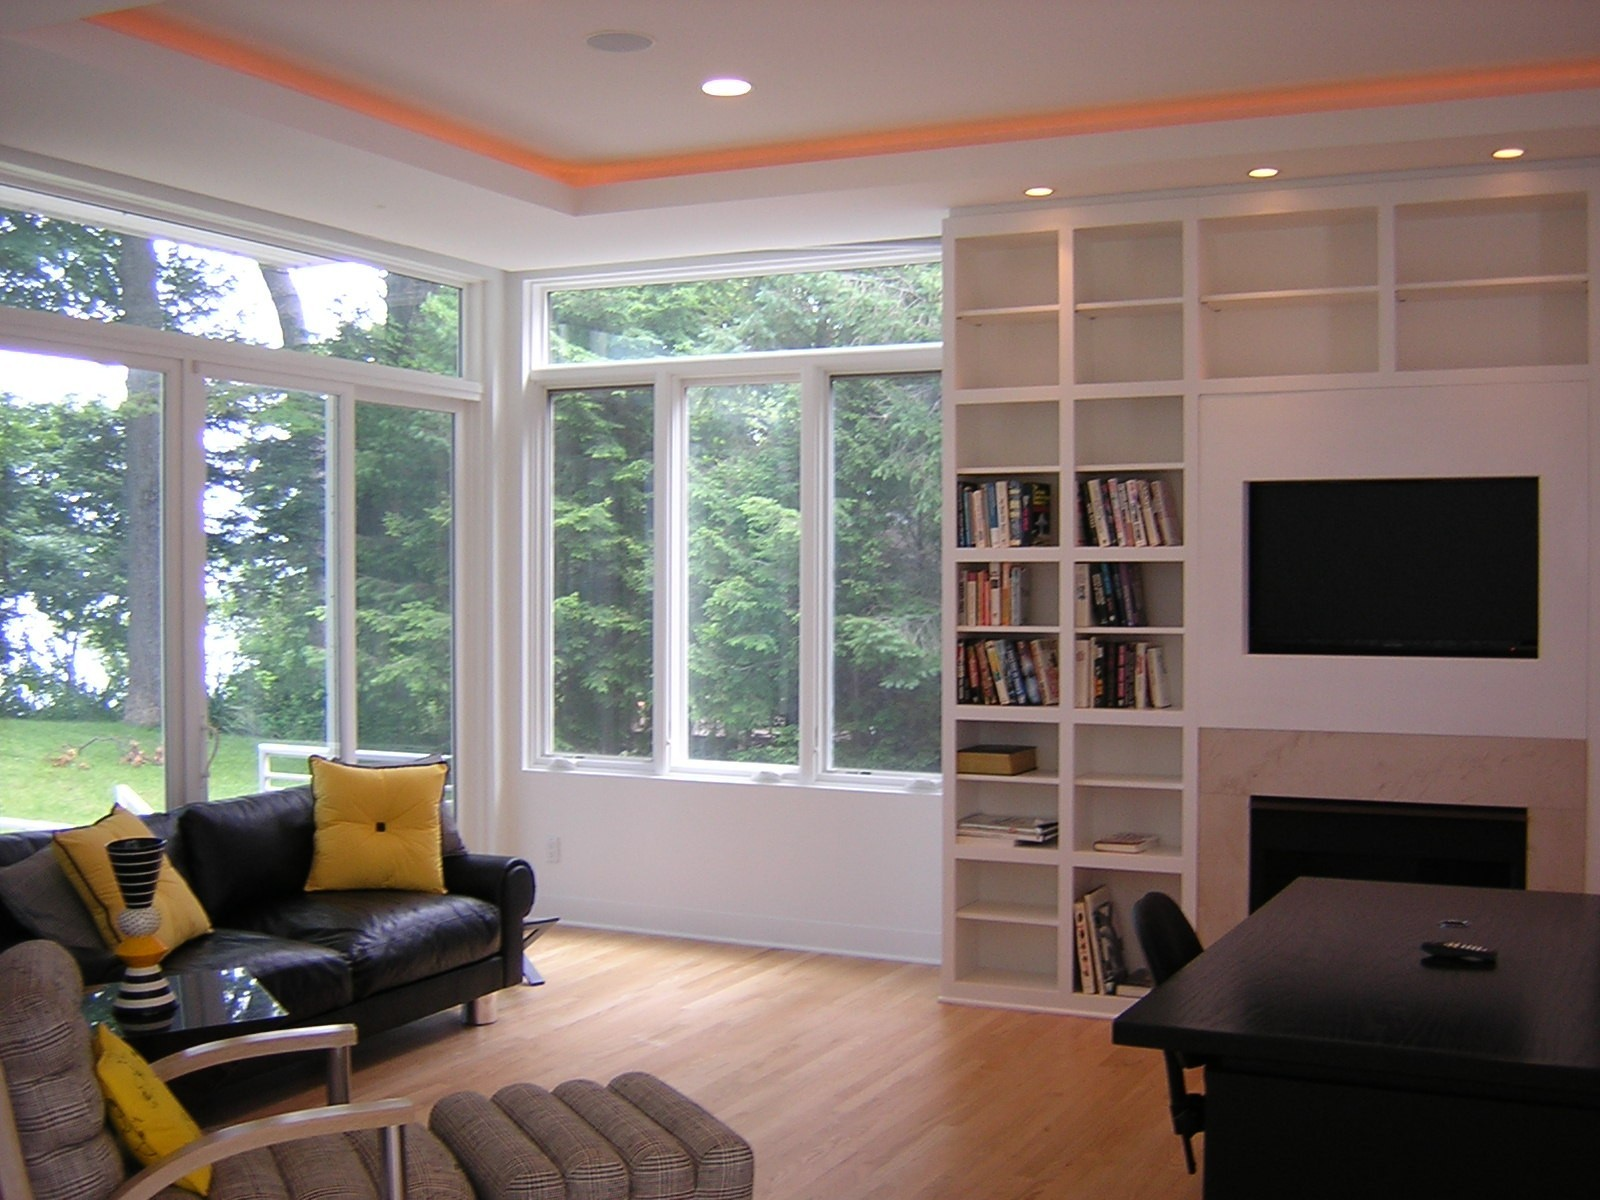 Real Estate Photography - 15930 Lake Ave, Union Pier, MI, 49129 - Location 1